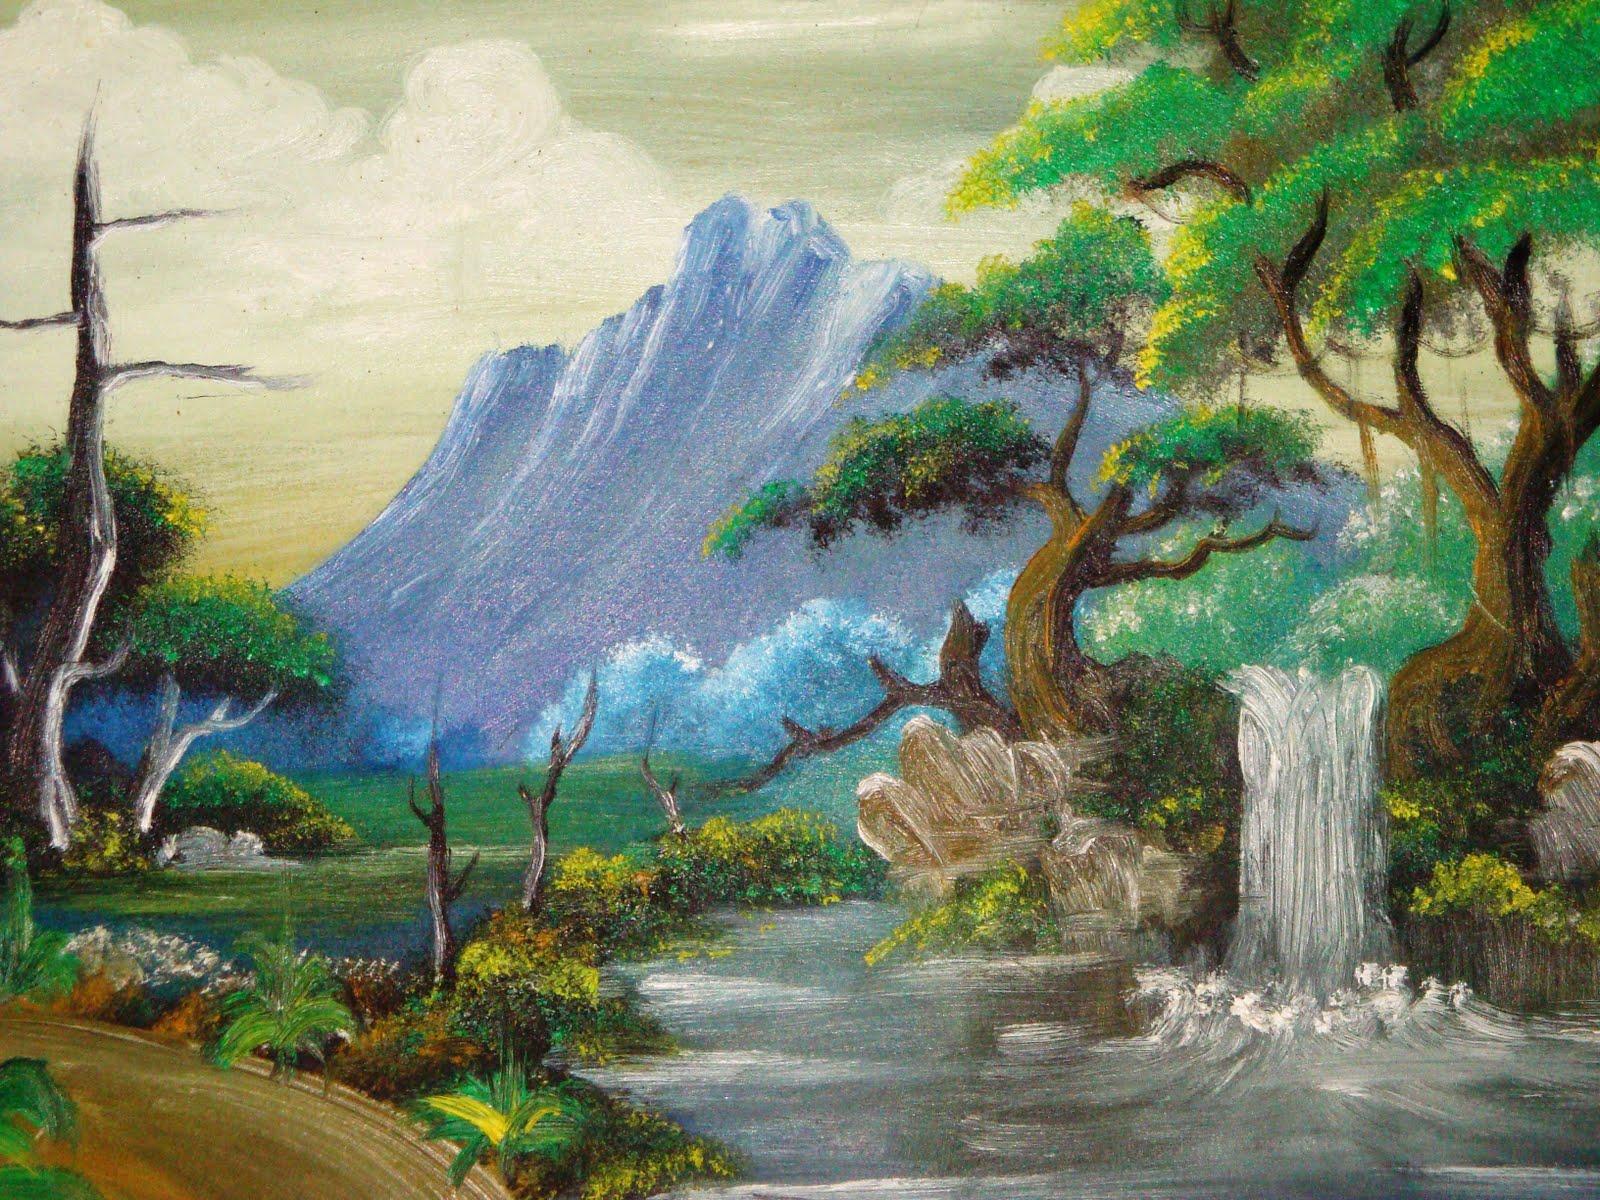 Lukisan alam